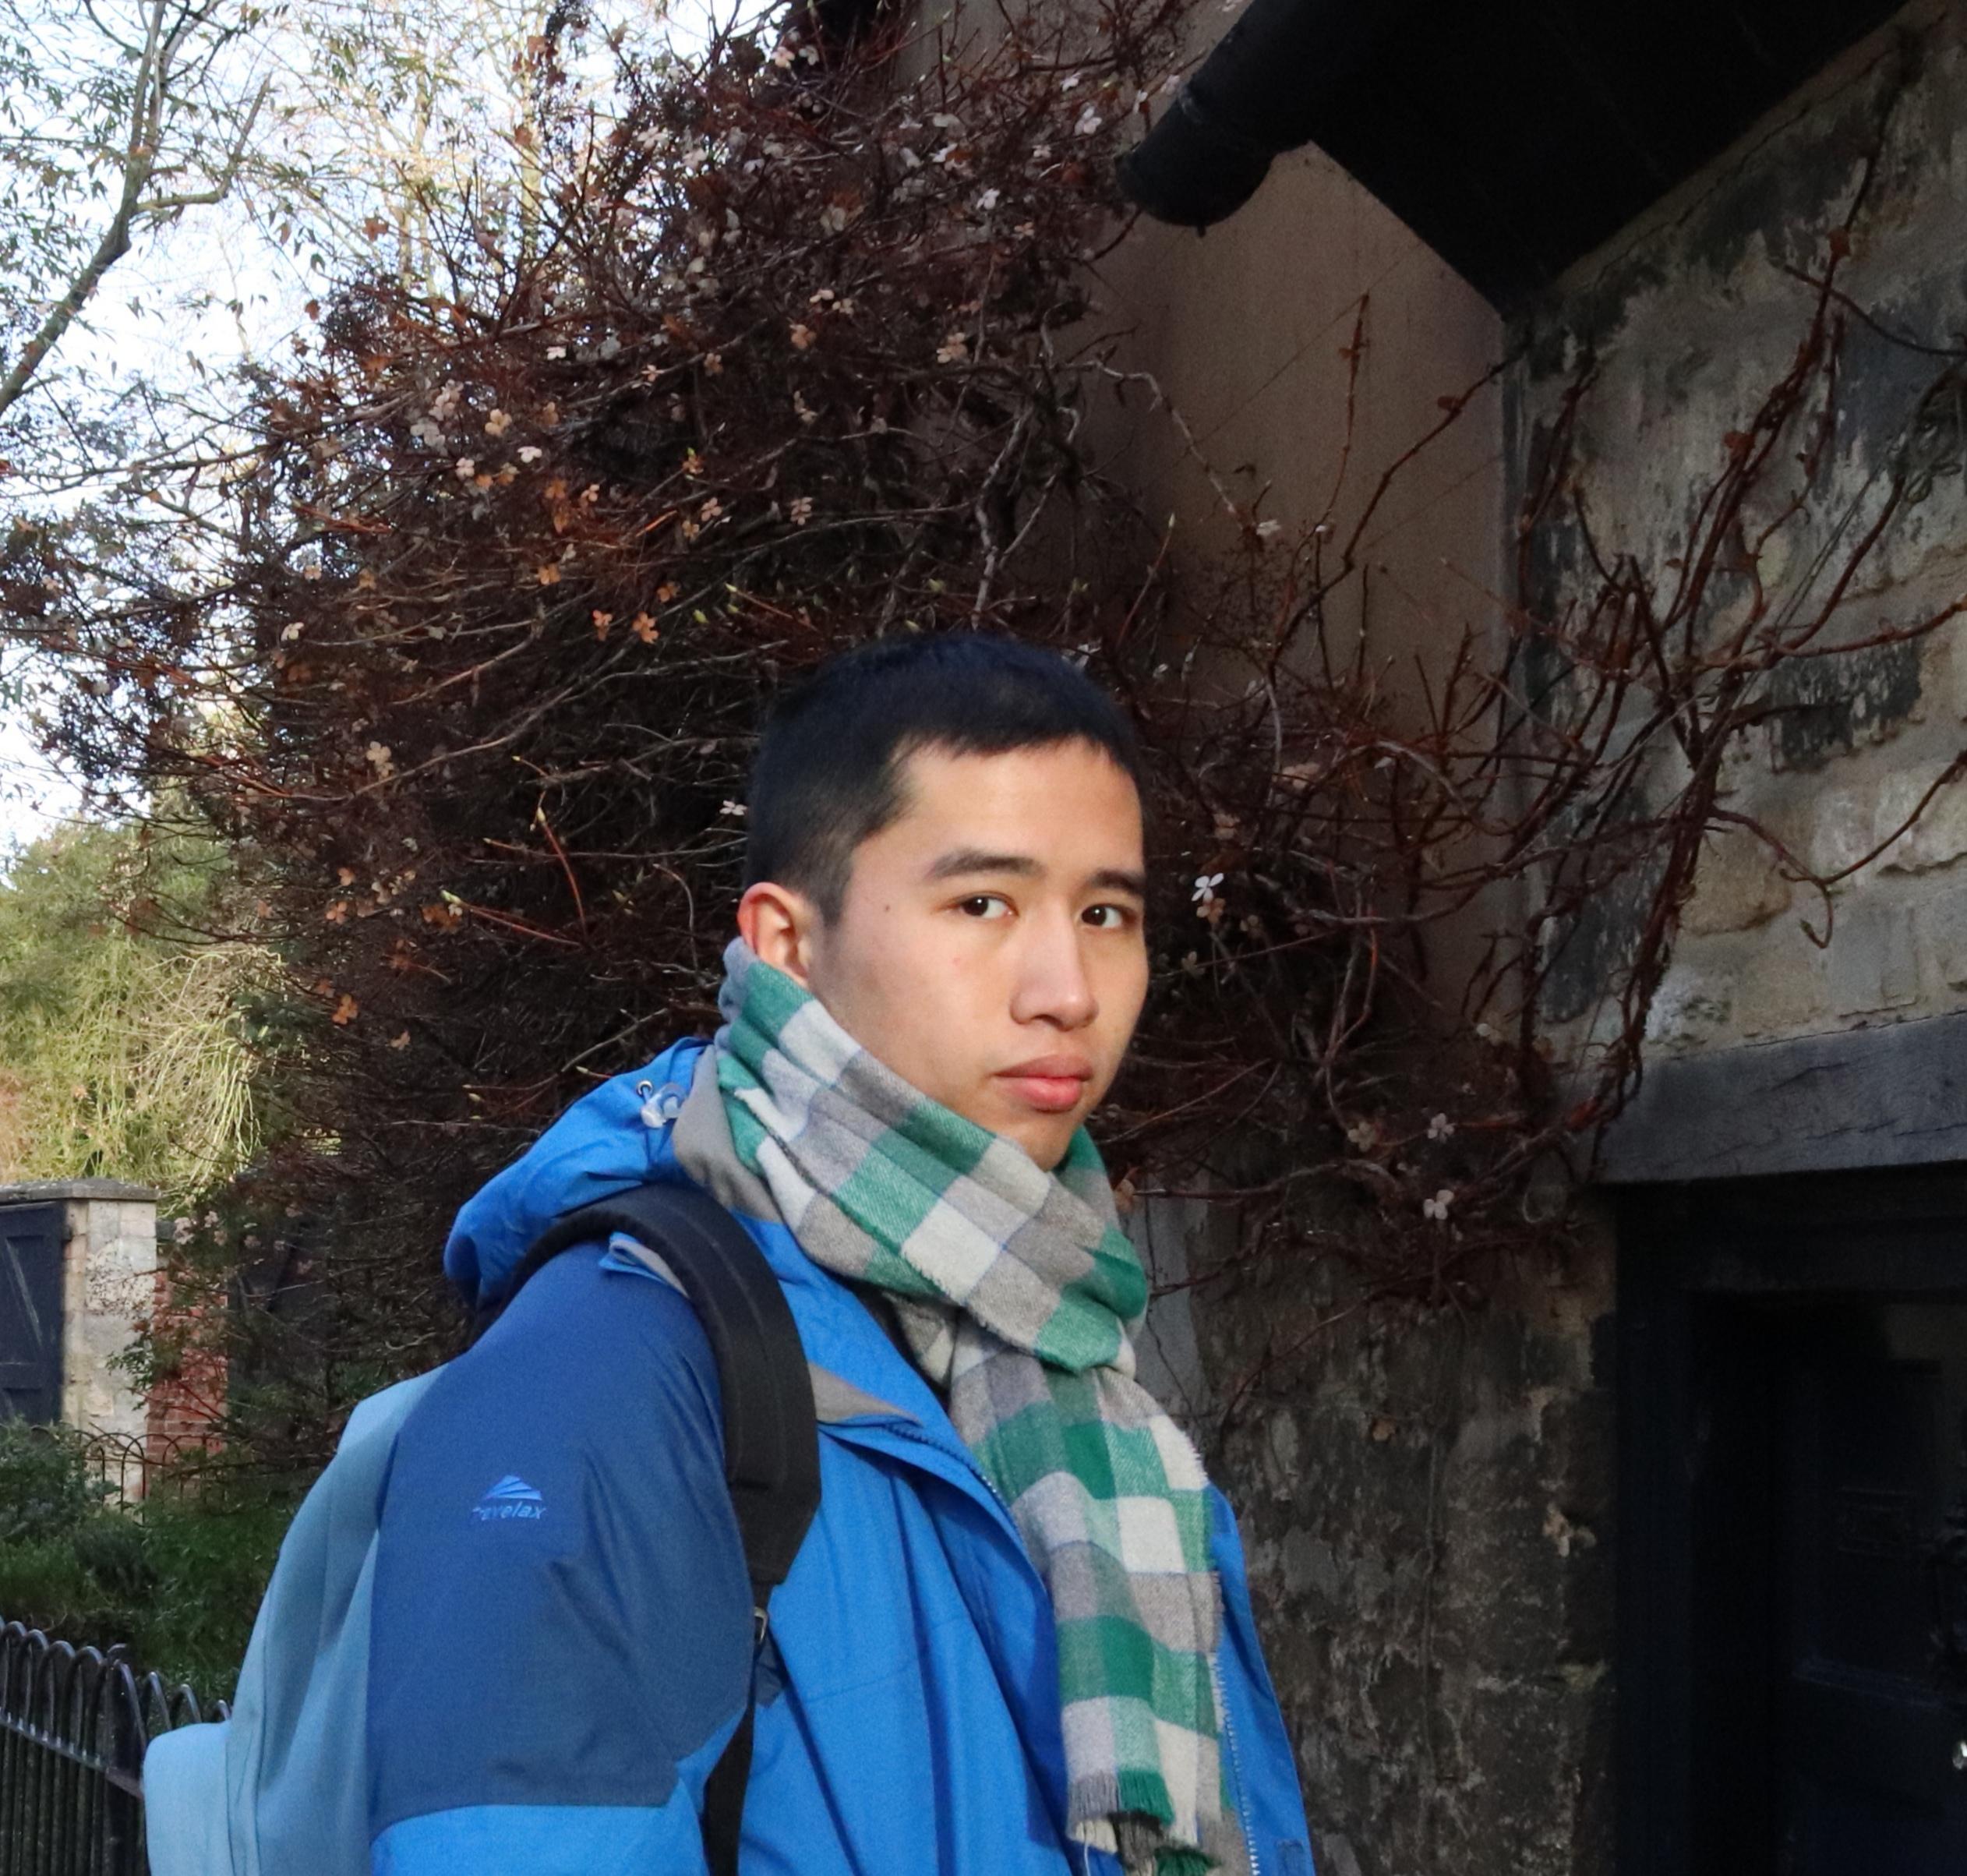 Difan Zou